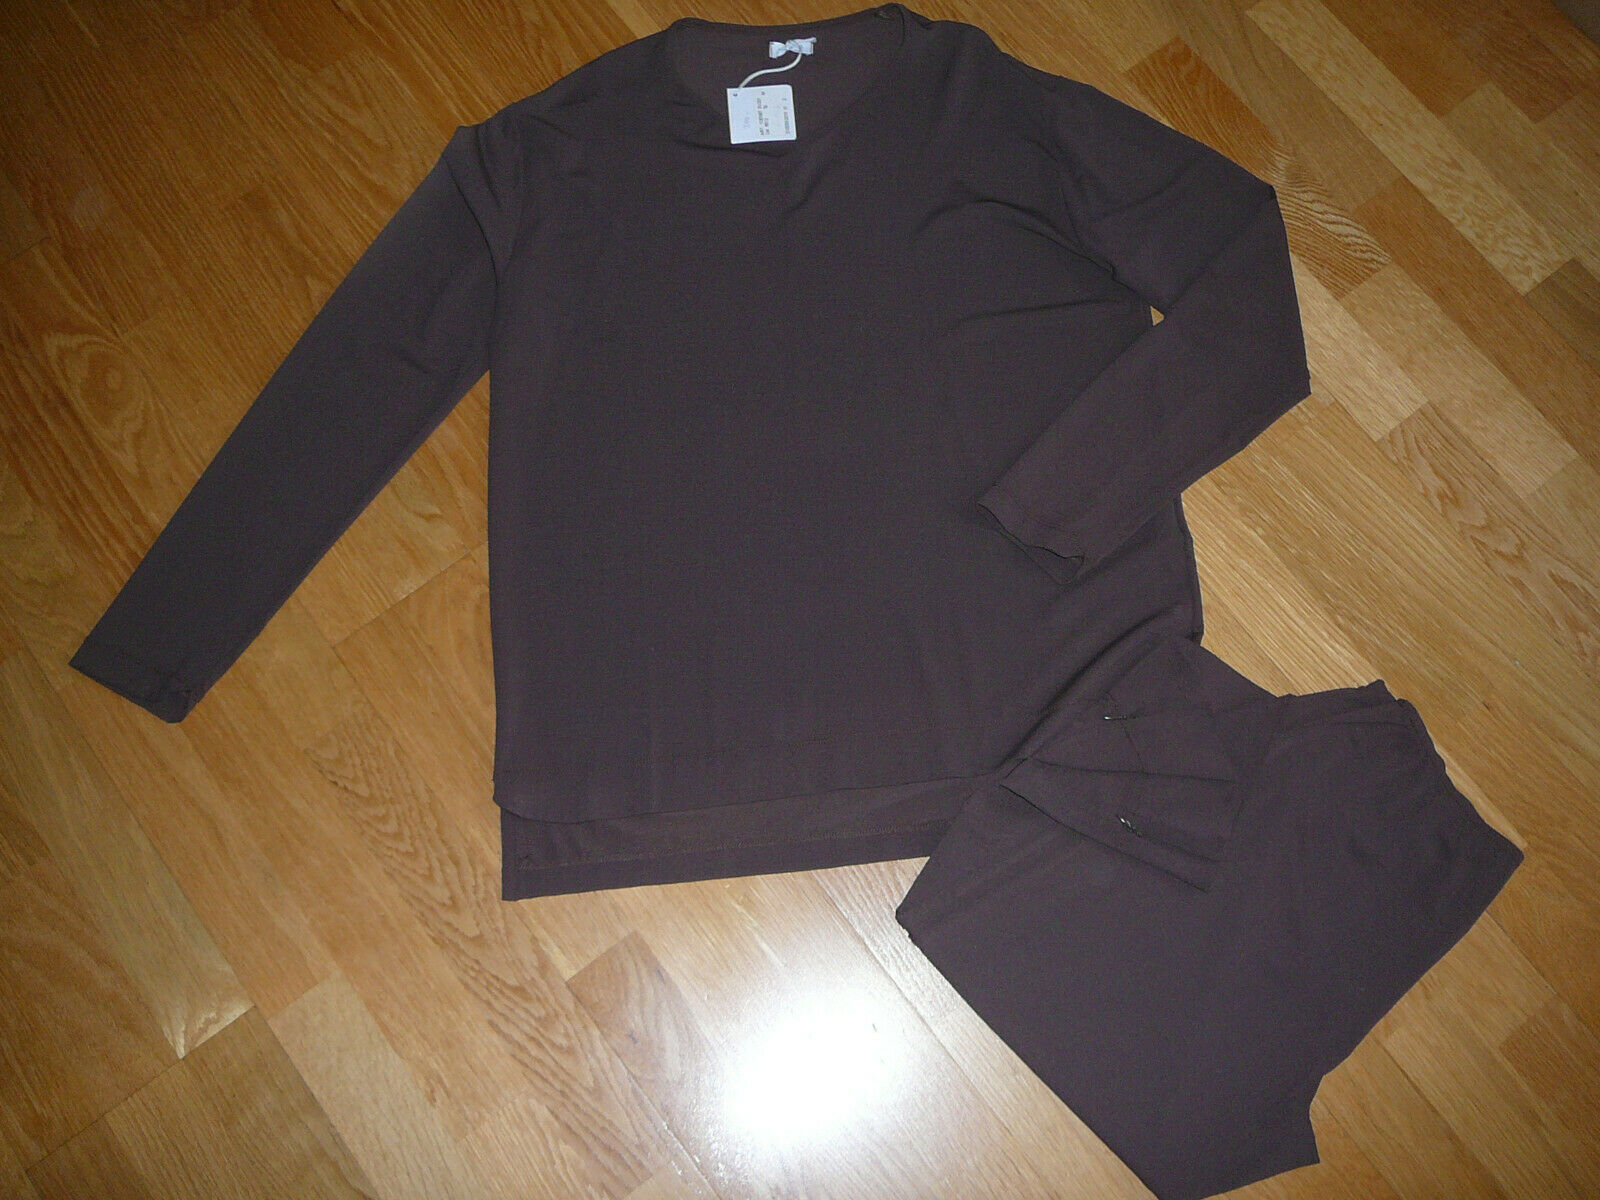 Virginia Damenhose- und Langarmoberteilkombination braun Gr. M neu